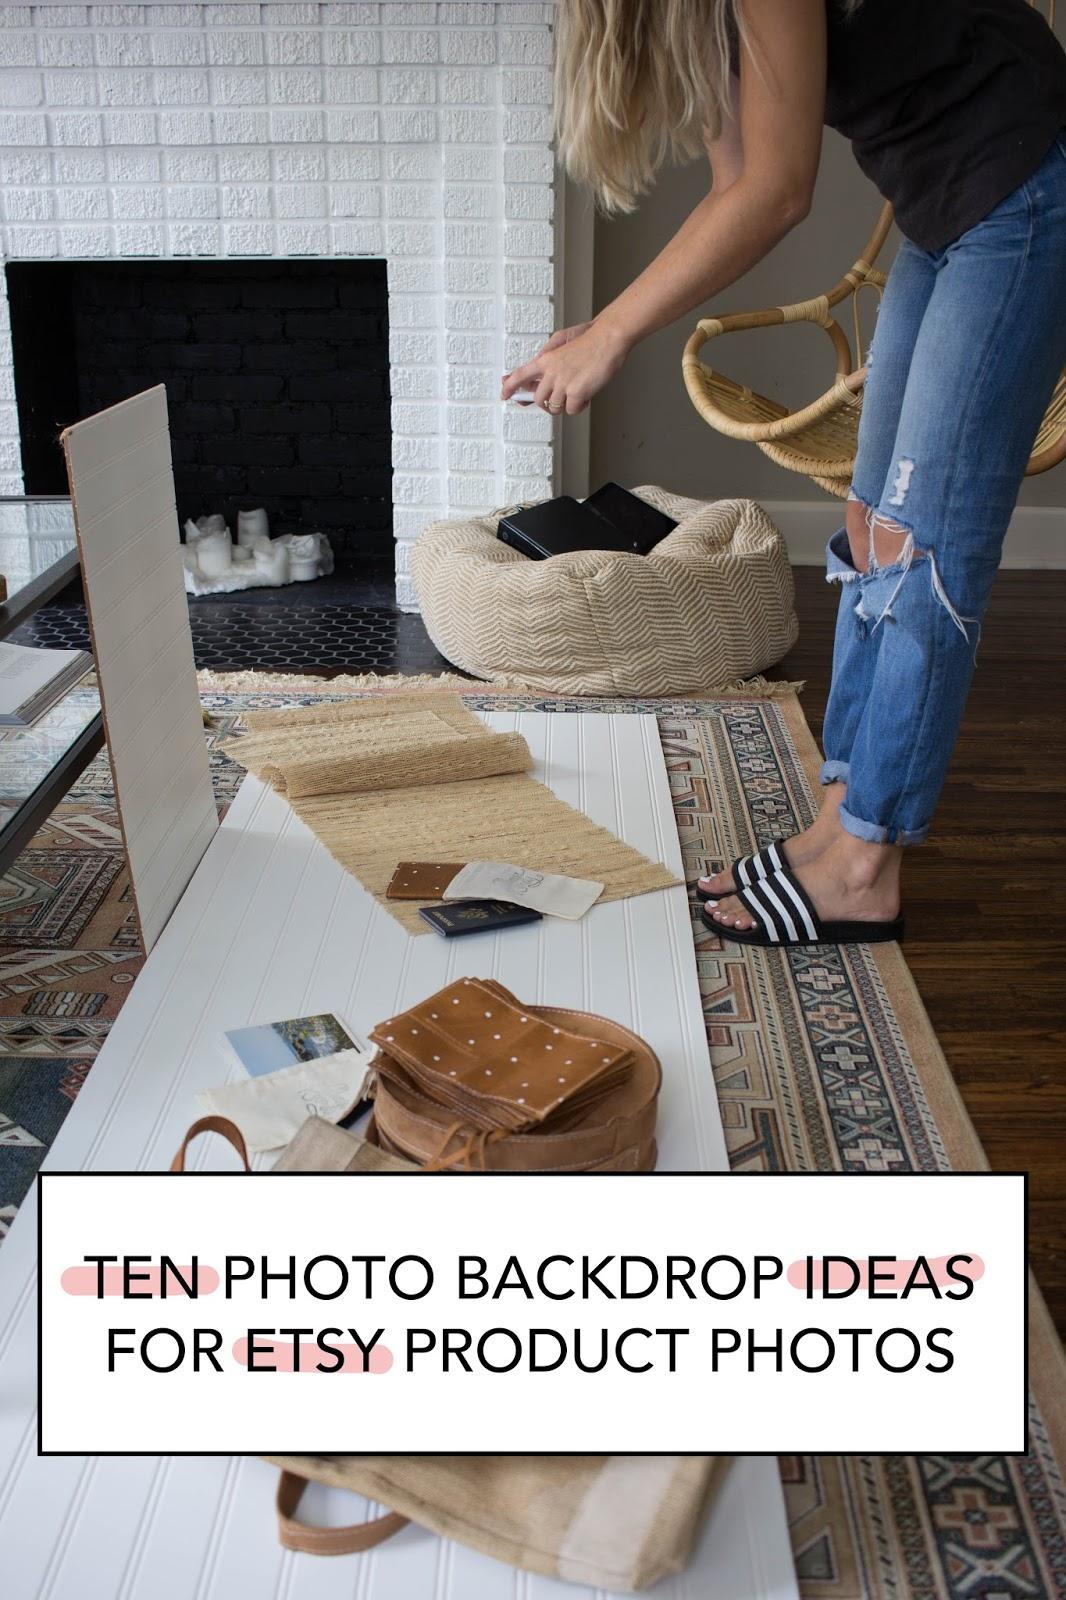 10 Photo Backdrop Ideas For Etsy Product Photos